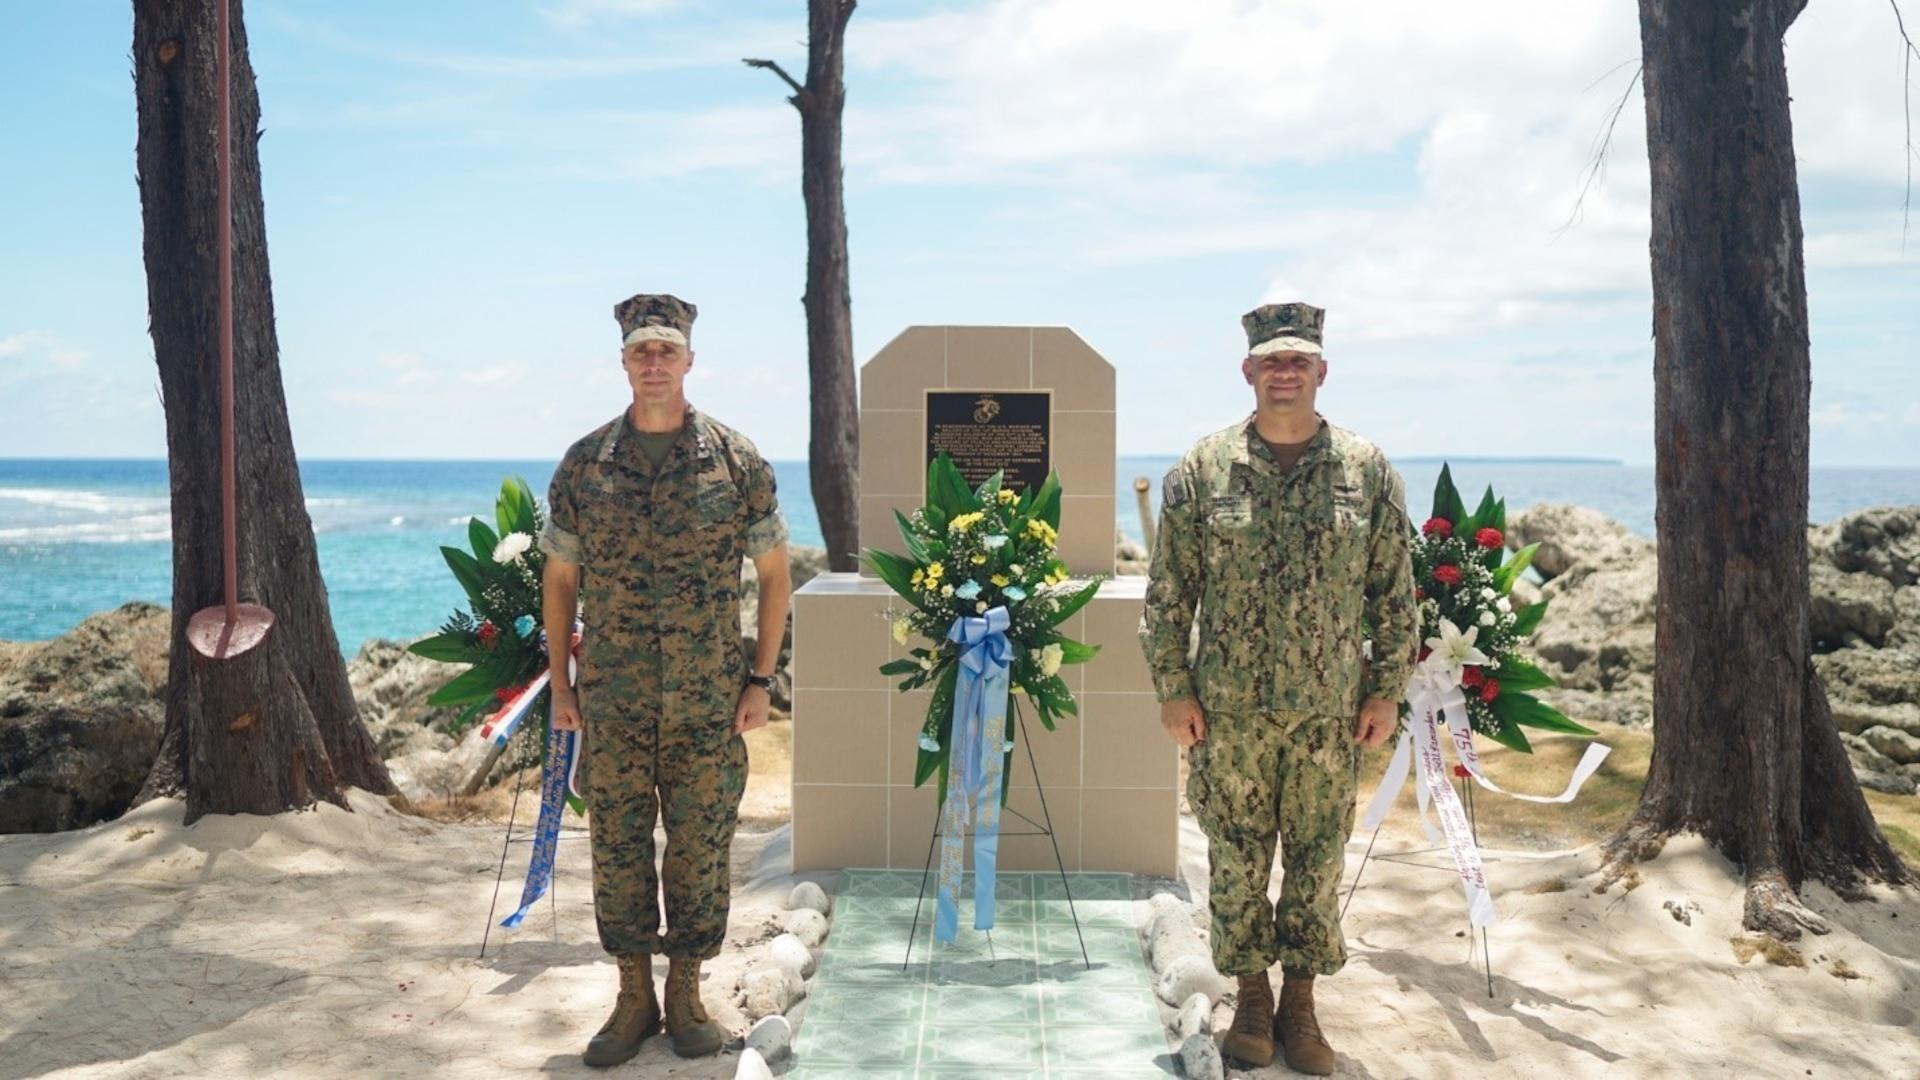 Progress Through Partnership: Remembering World War II in the Republic of Palau